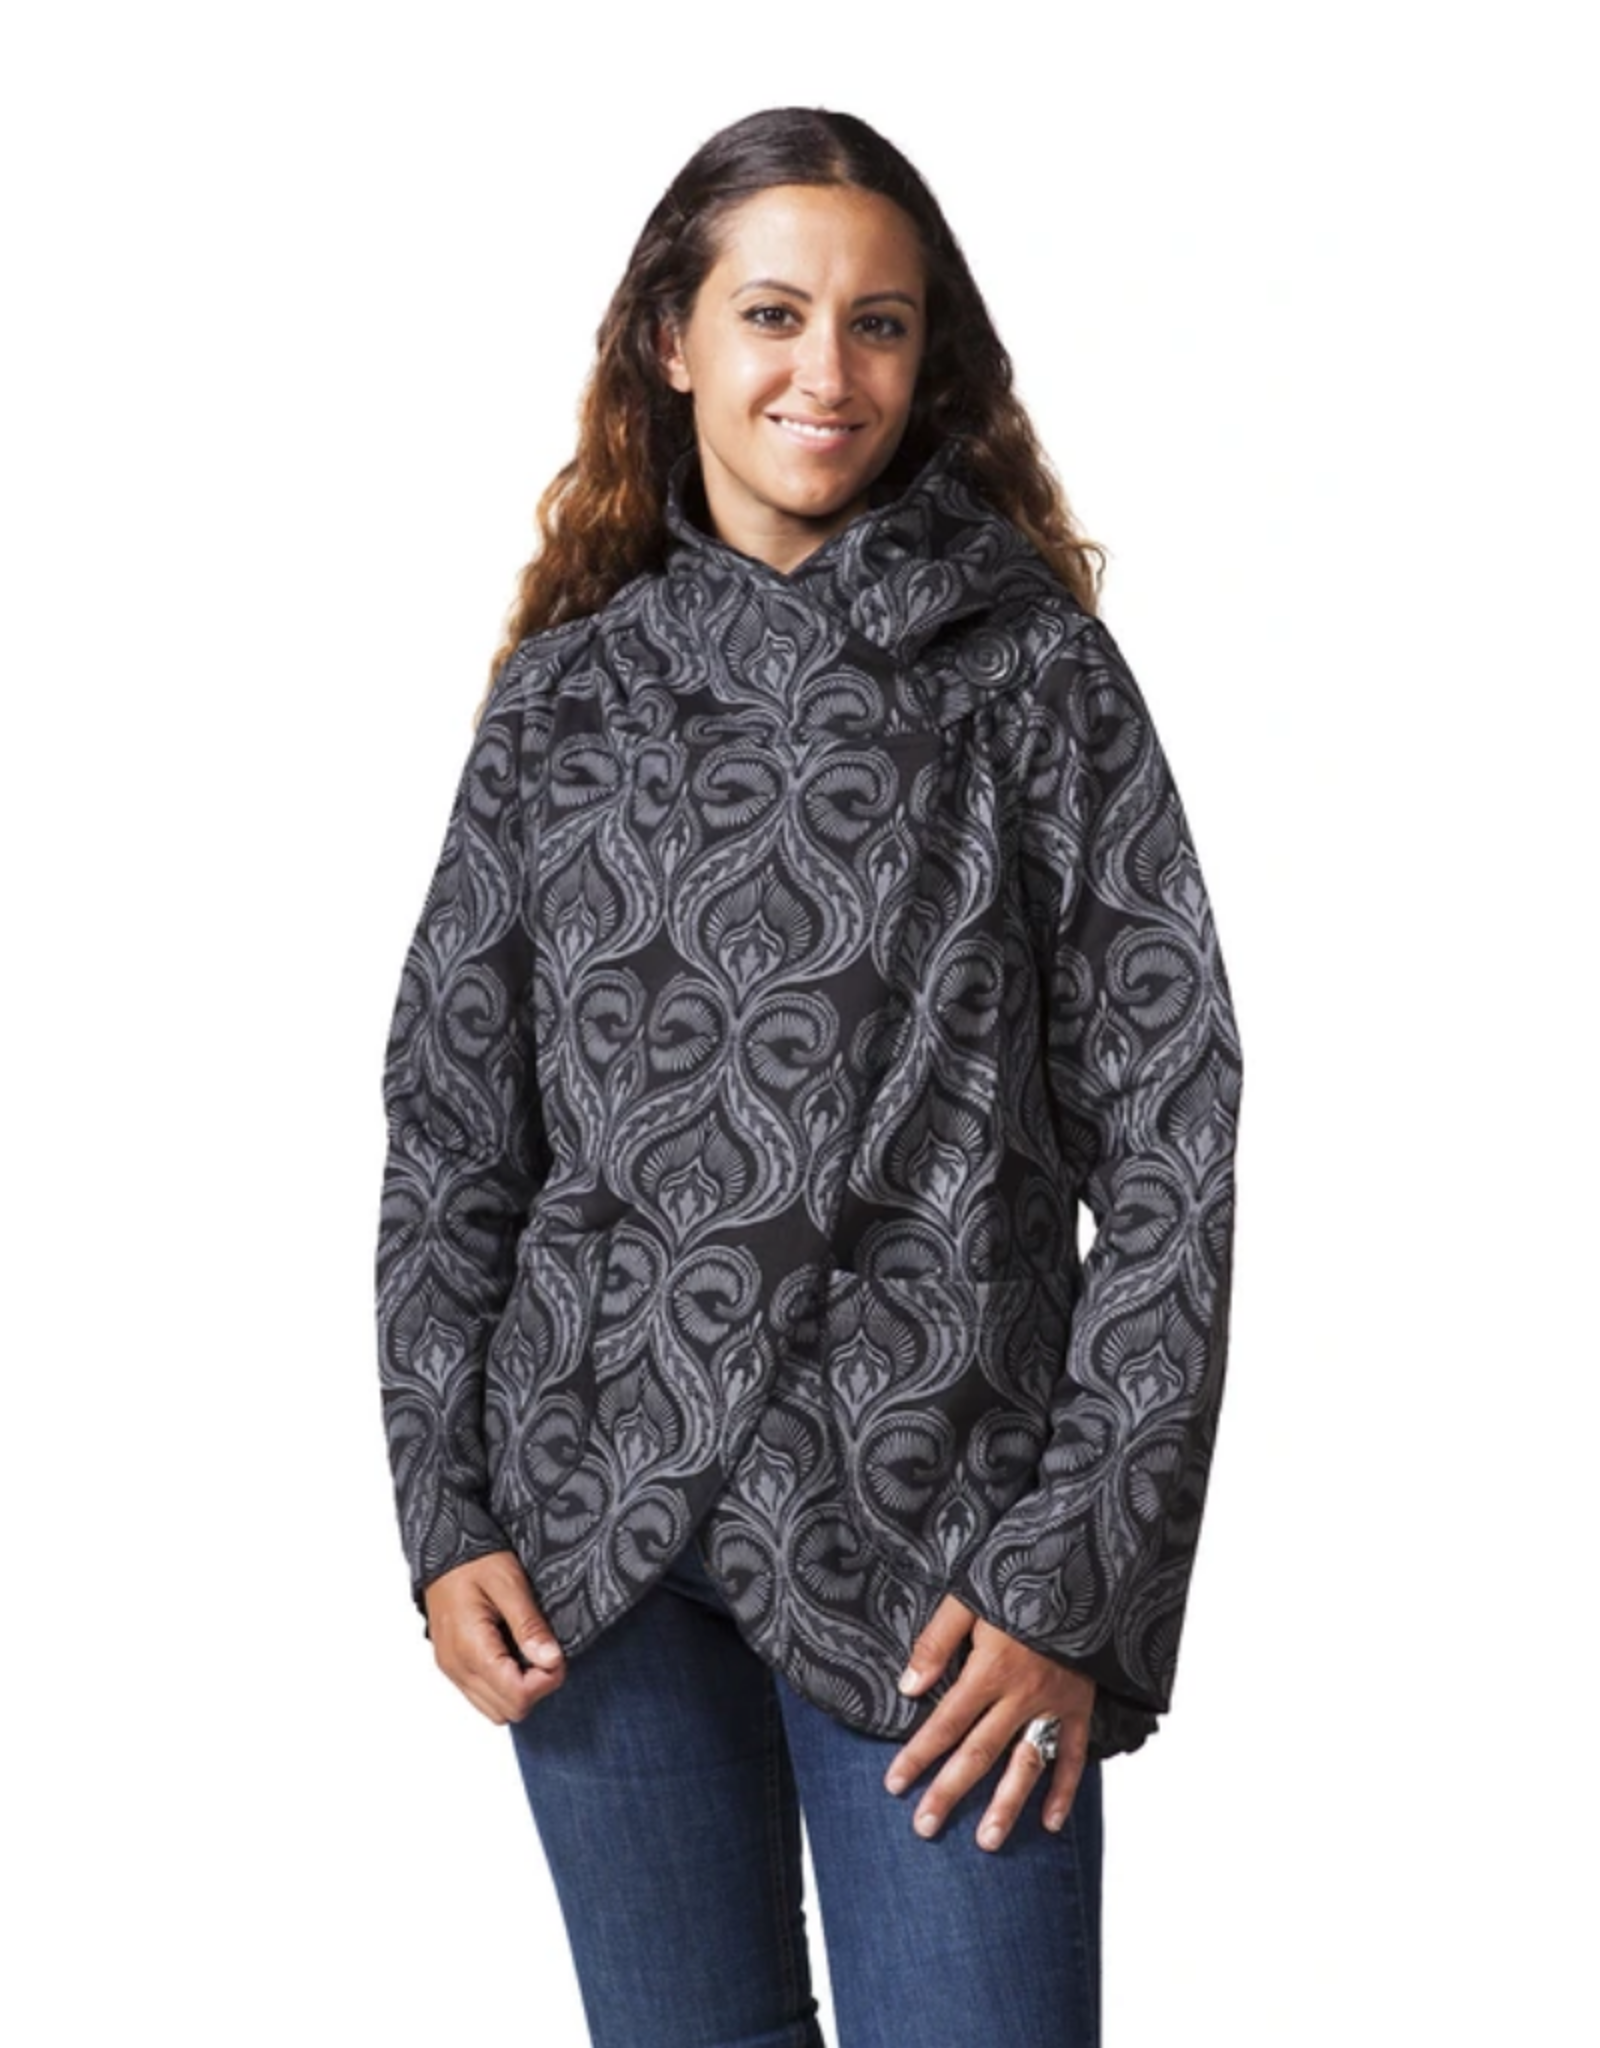 Ark Imports Lava Jacket, Black S